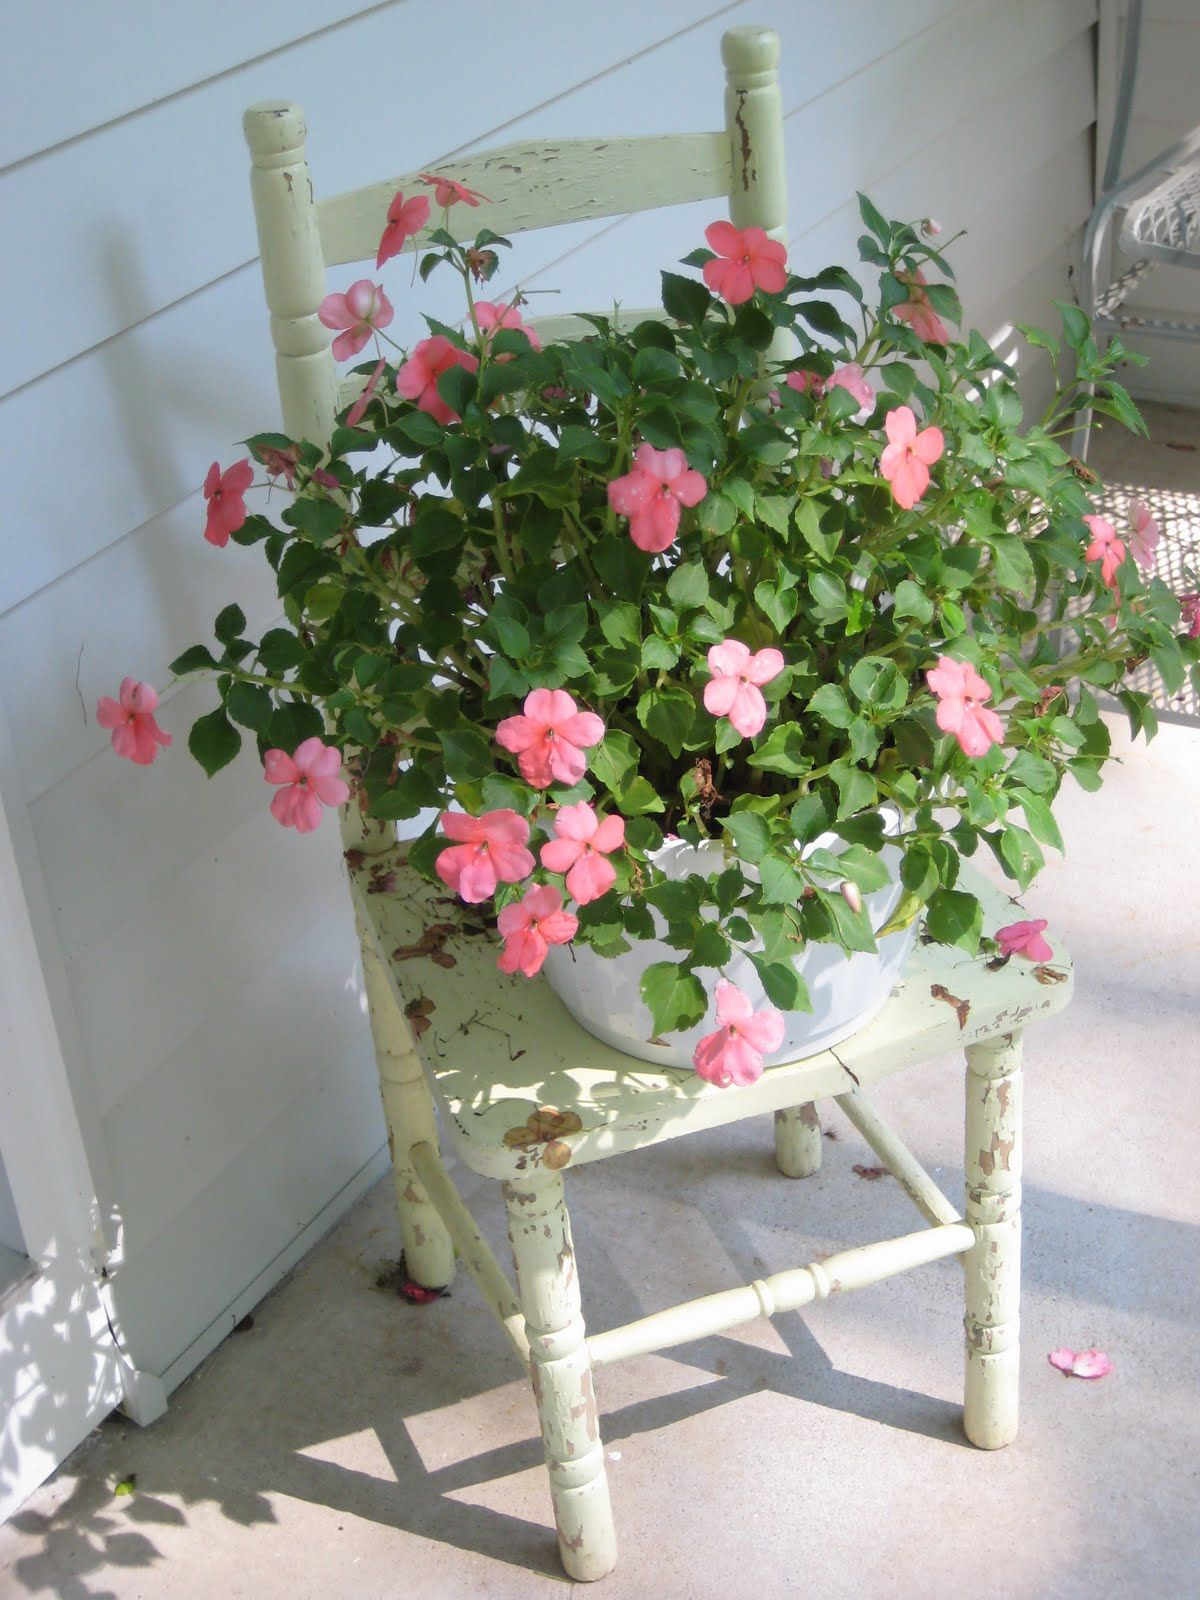 Decorating with Antiques | Dianne Zweig - Kitsch 'n Stuff: Decorating With Garden Antiques And ...